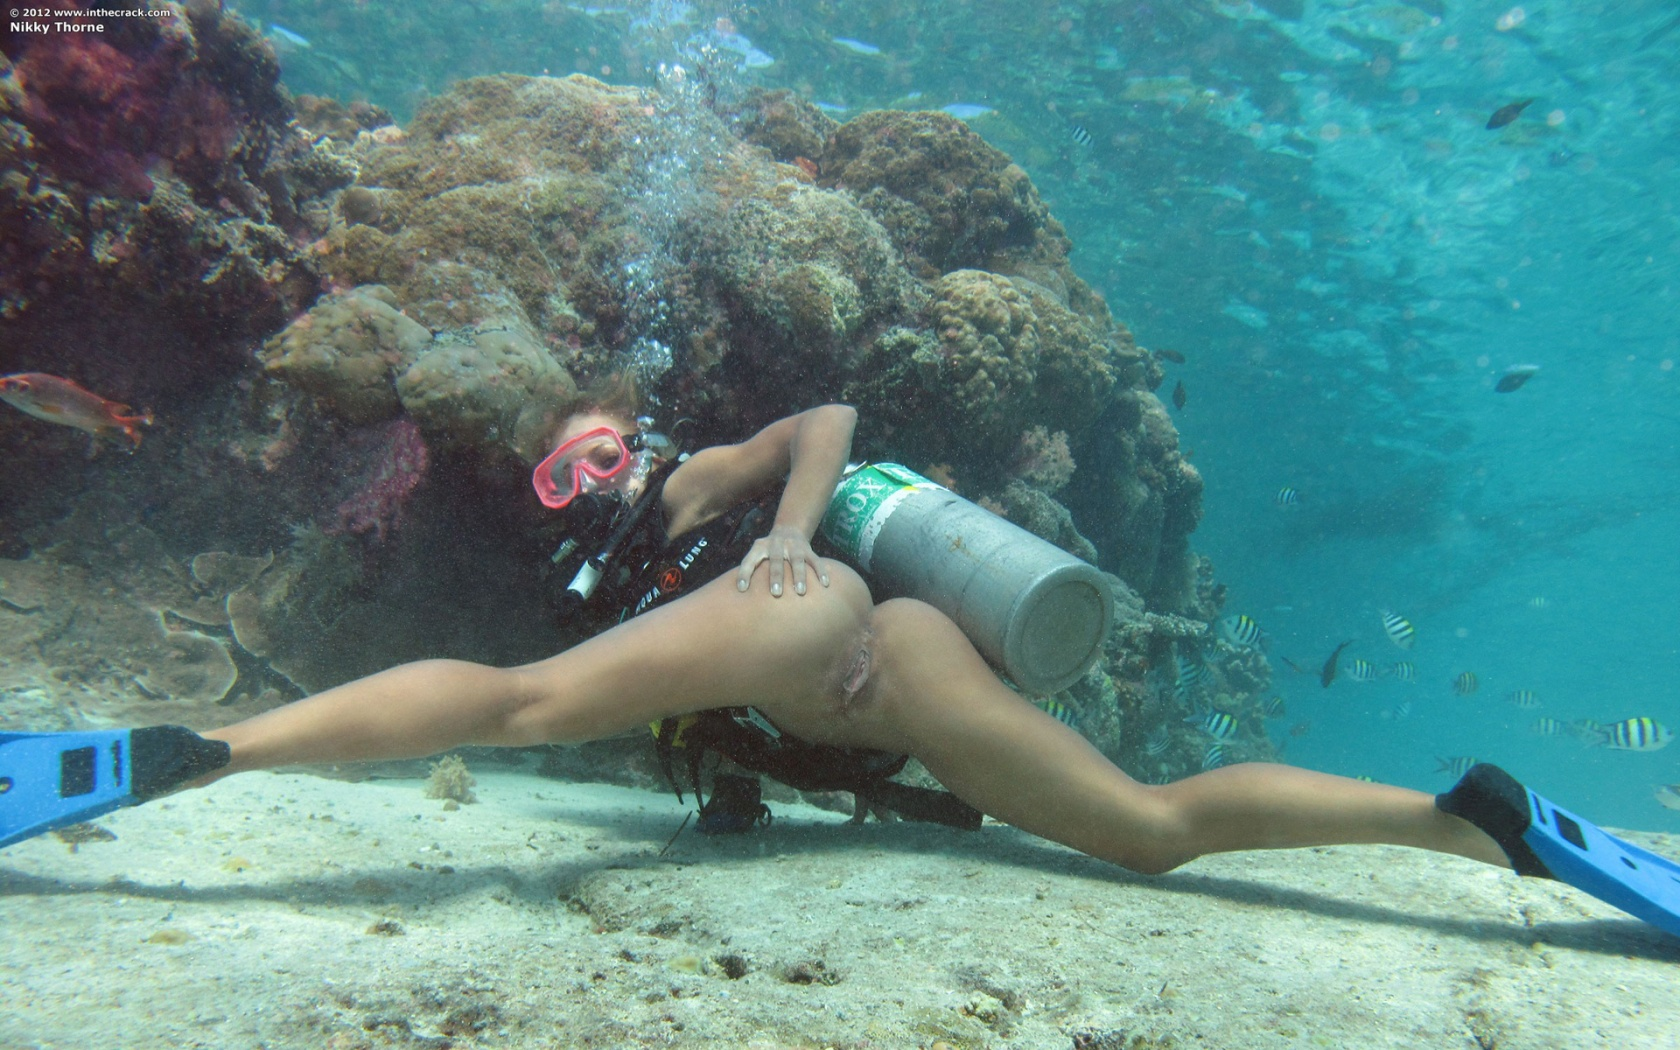 Nikky thorne nude underwater scuba diving amusing